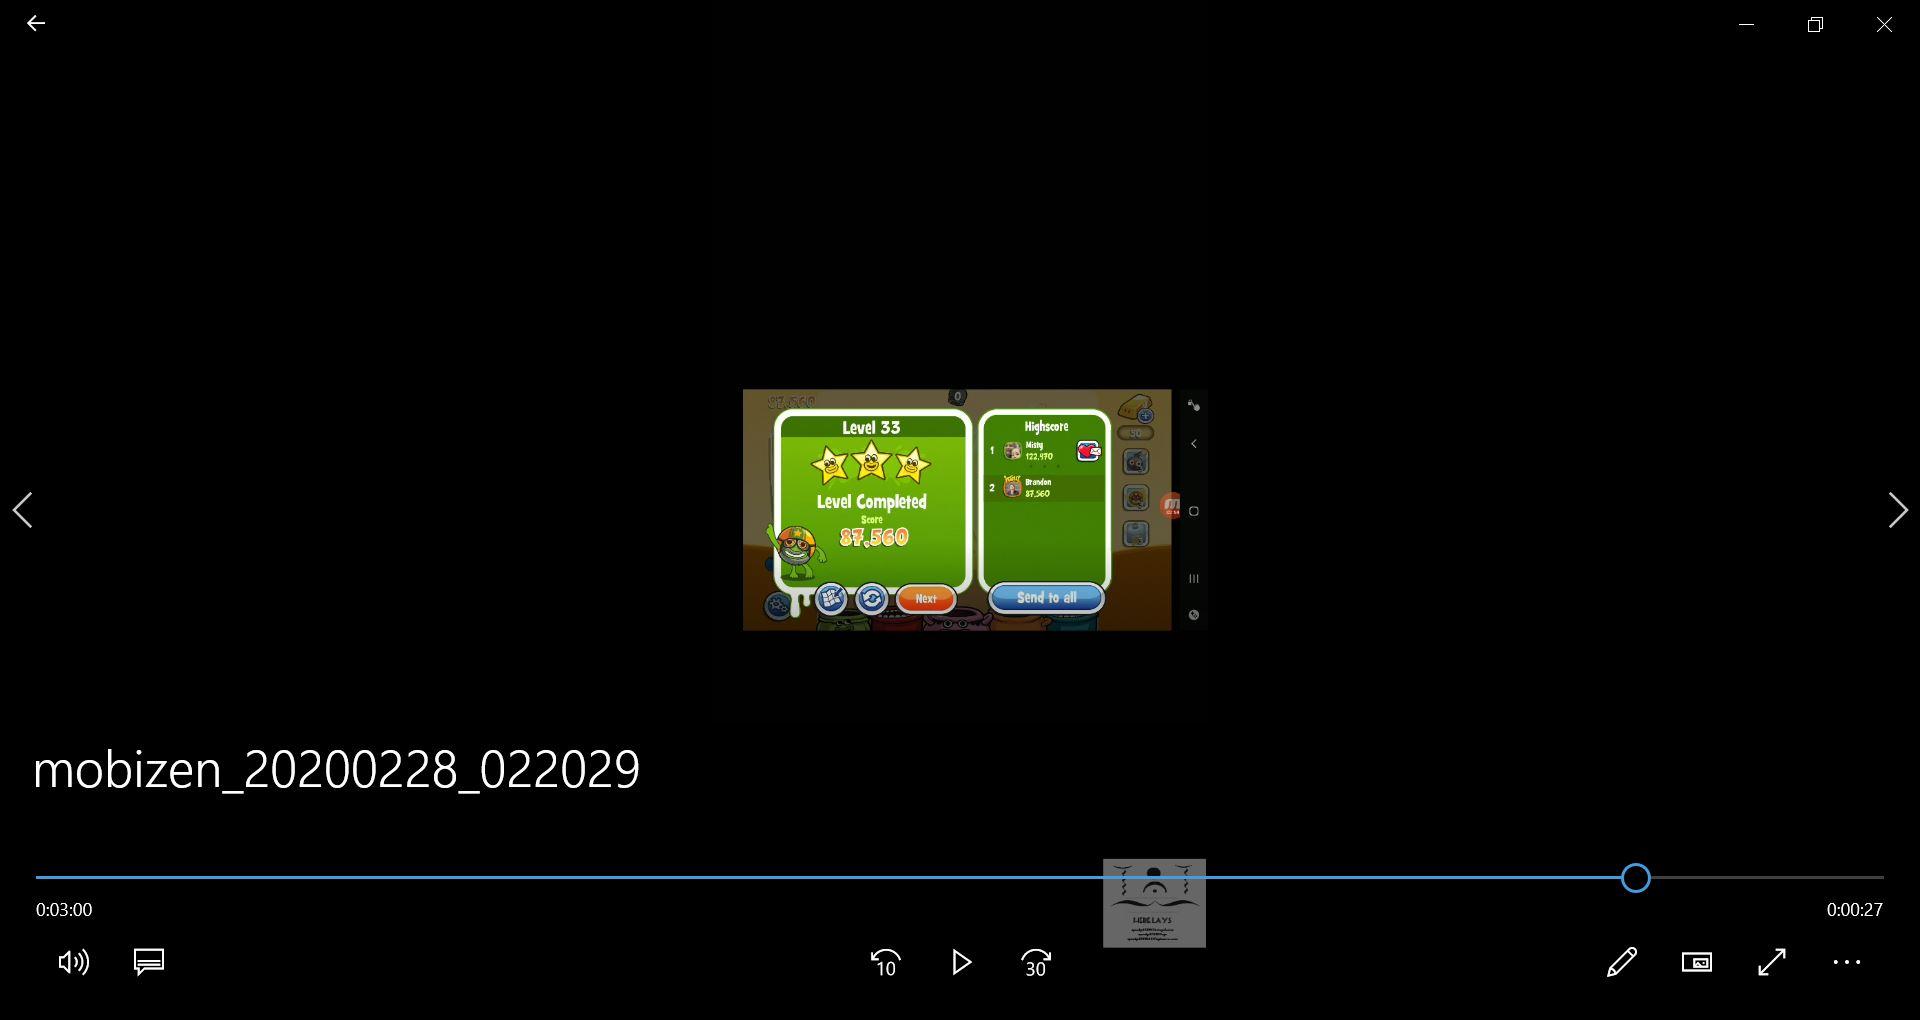 speedy4759123: Papa Pear Saga: Level 033 (Android) 87,560 points on 2020-03-13 07:44:51